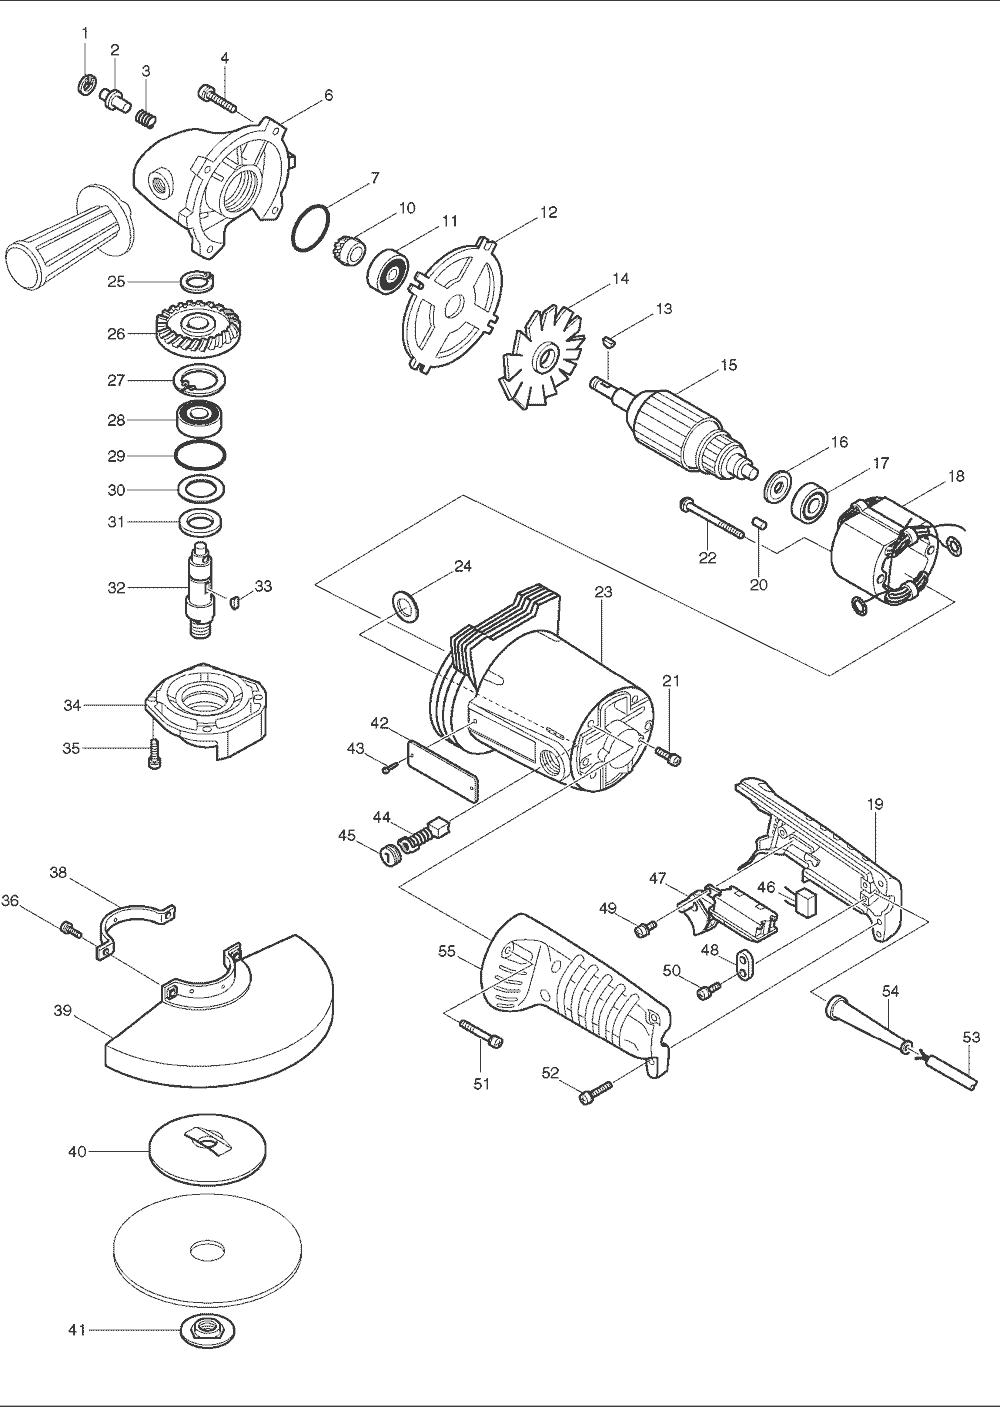 buy makita ga7911 7 9 inch ac dc angle grinder replacement tool makita ga7911 parts schematic